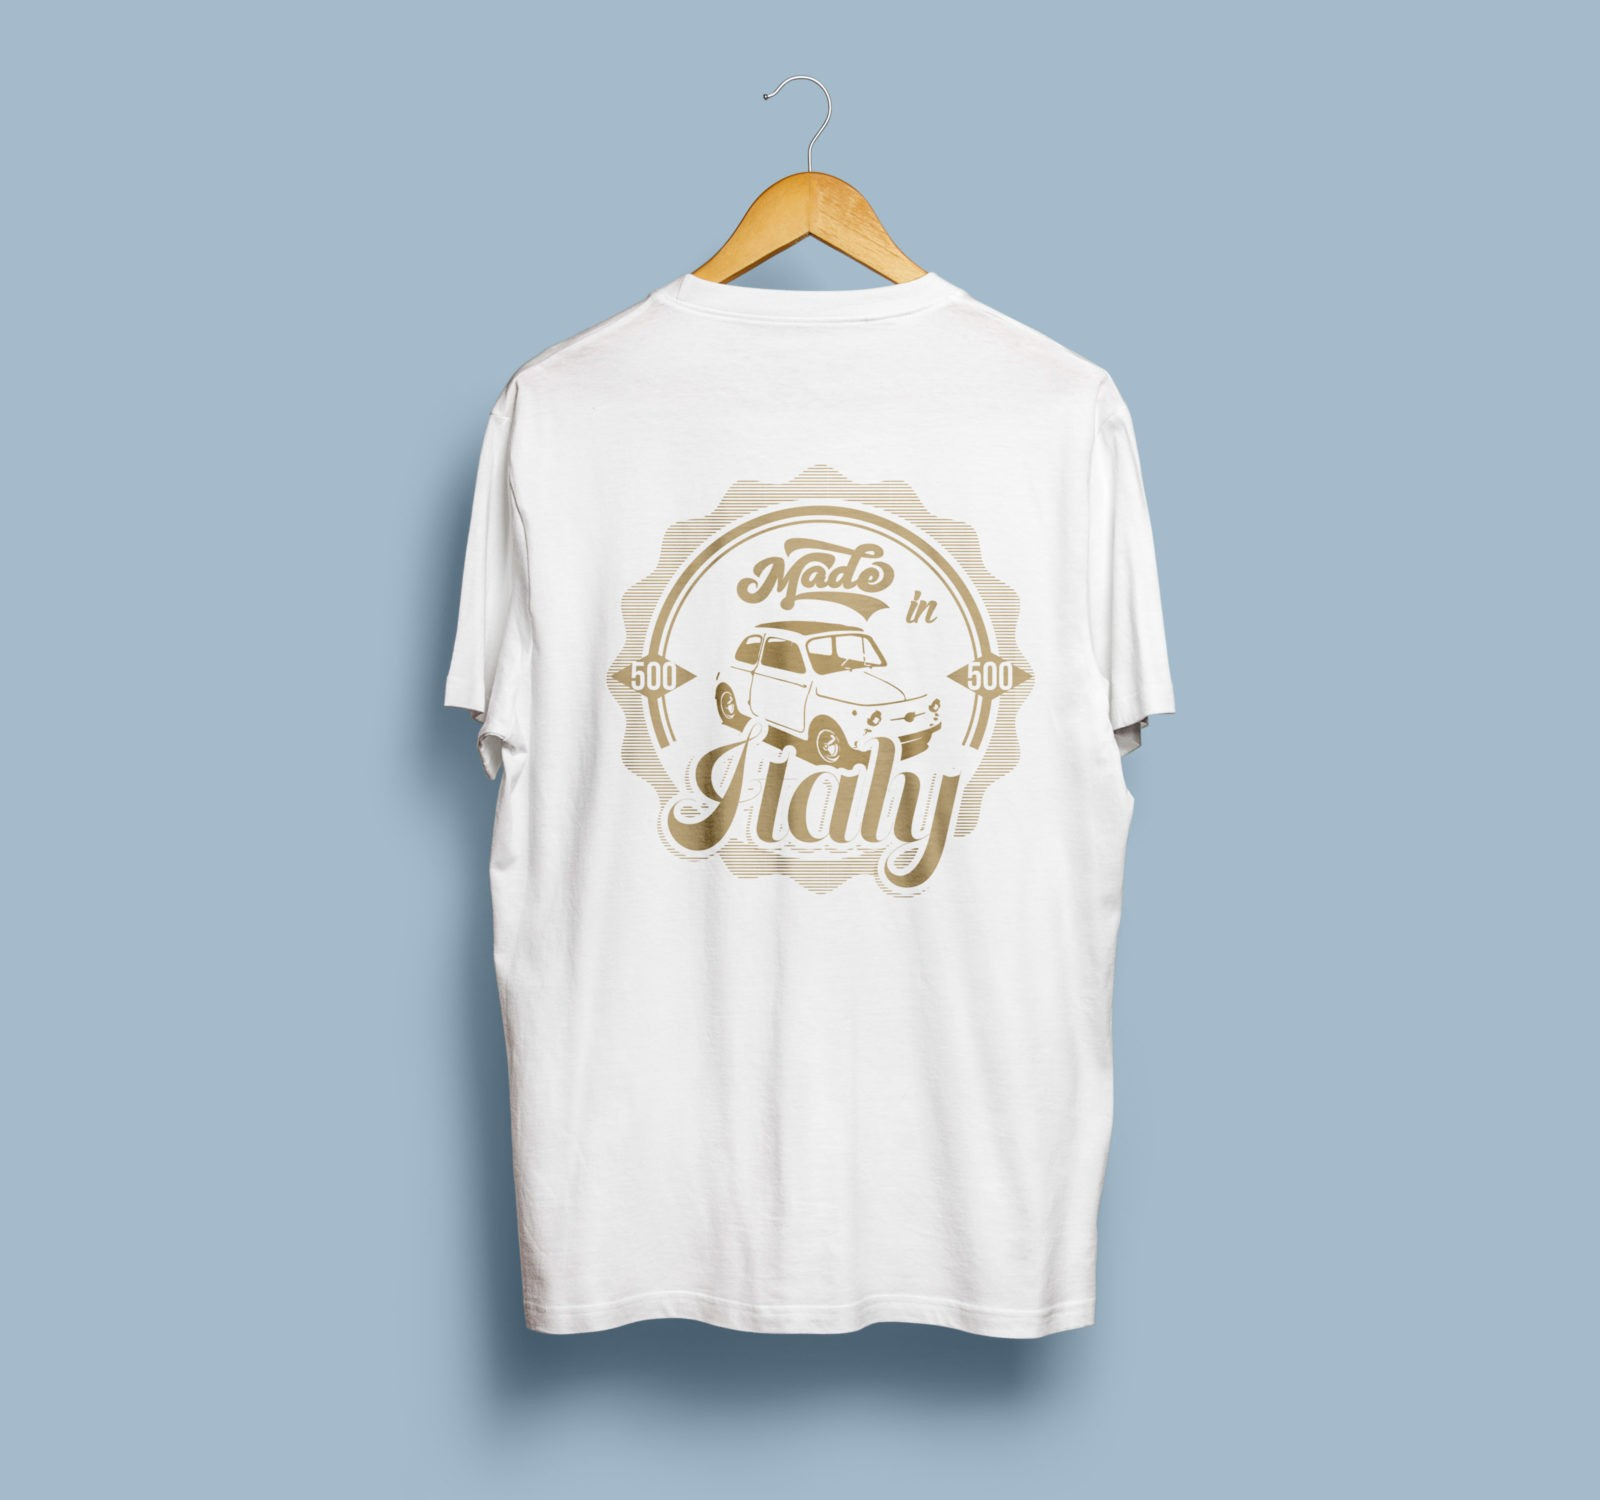 Italian t-shirt